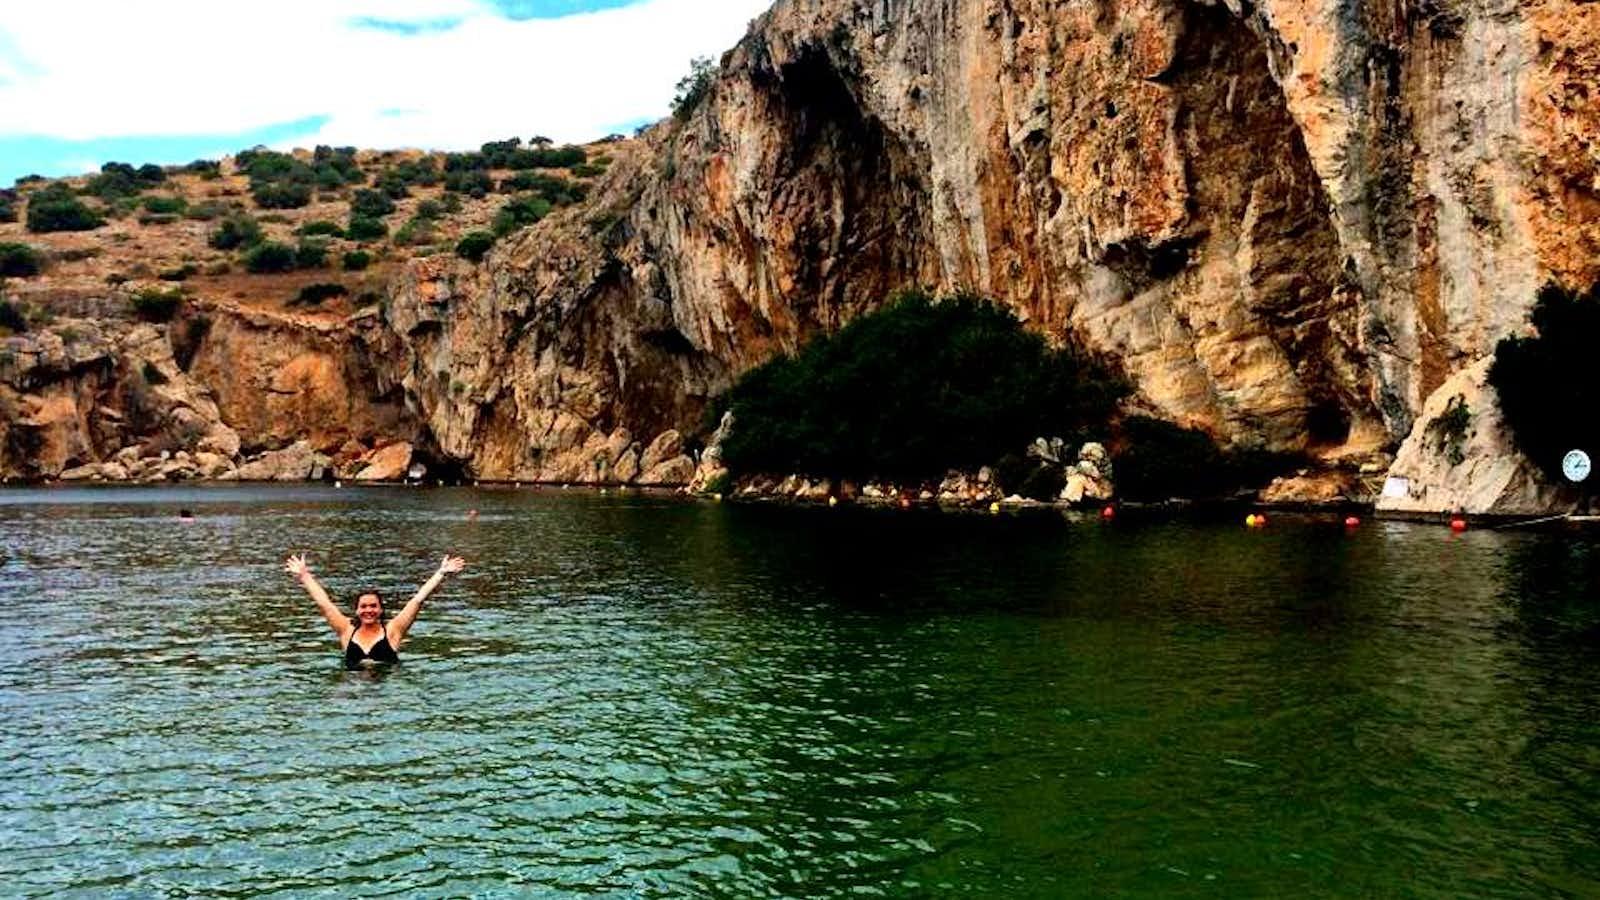 Exploring Vouliagmeni Lake